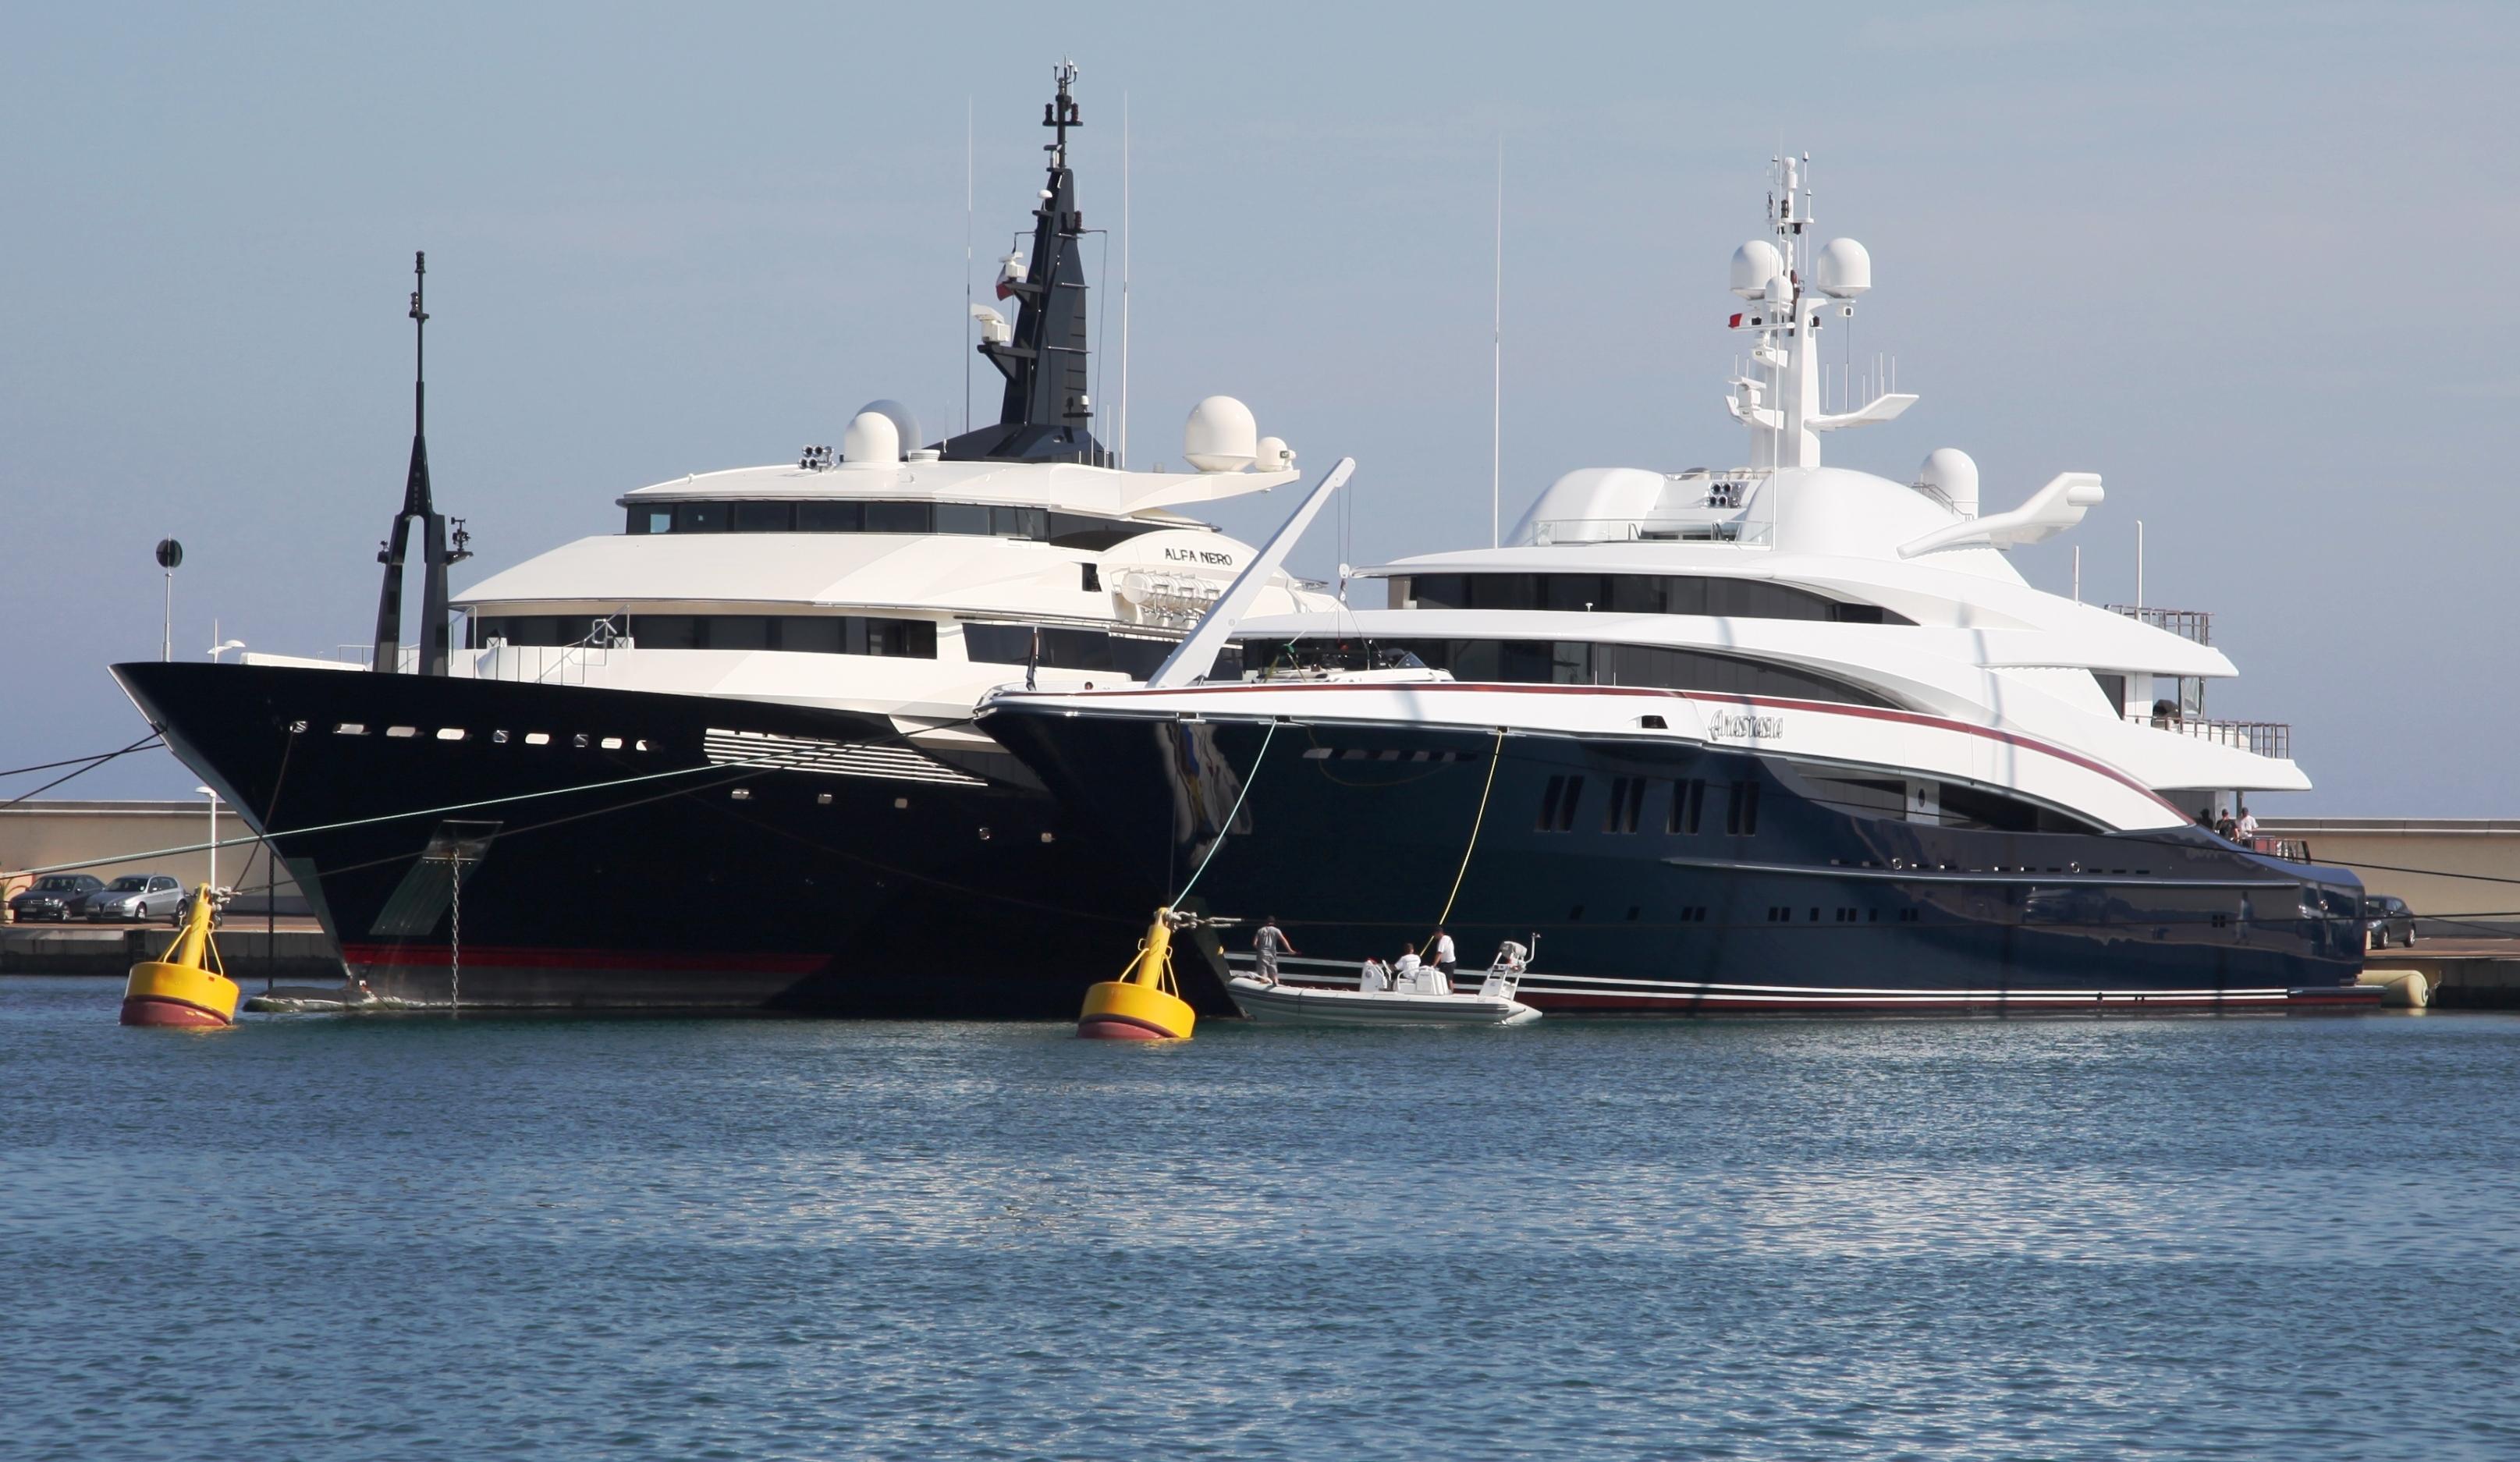 OceAnco Yachts ANASTASIA And ALFA NERO In Antibes, France